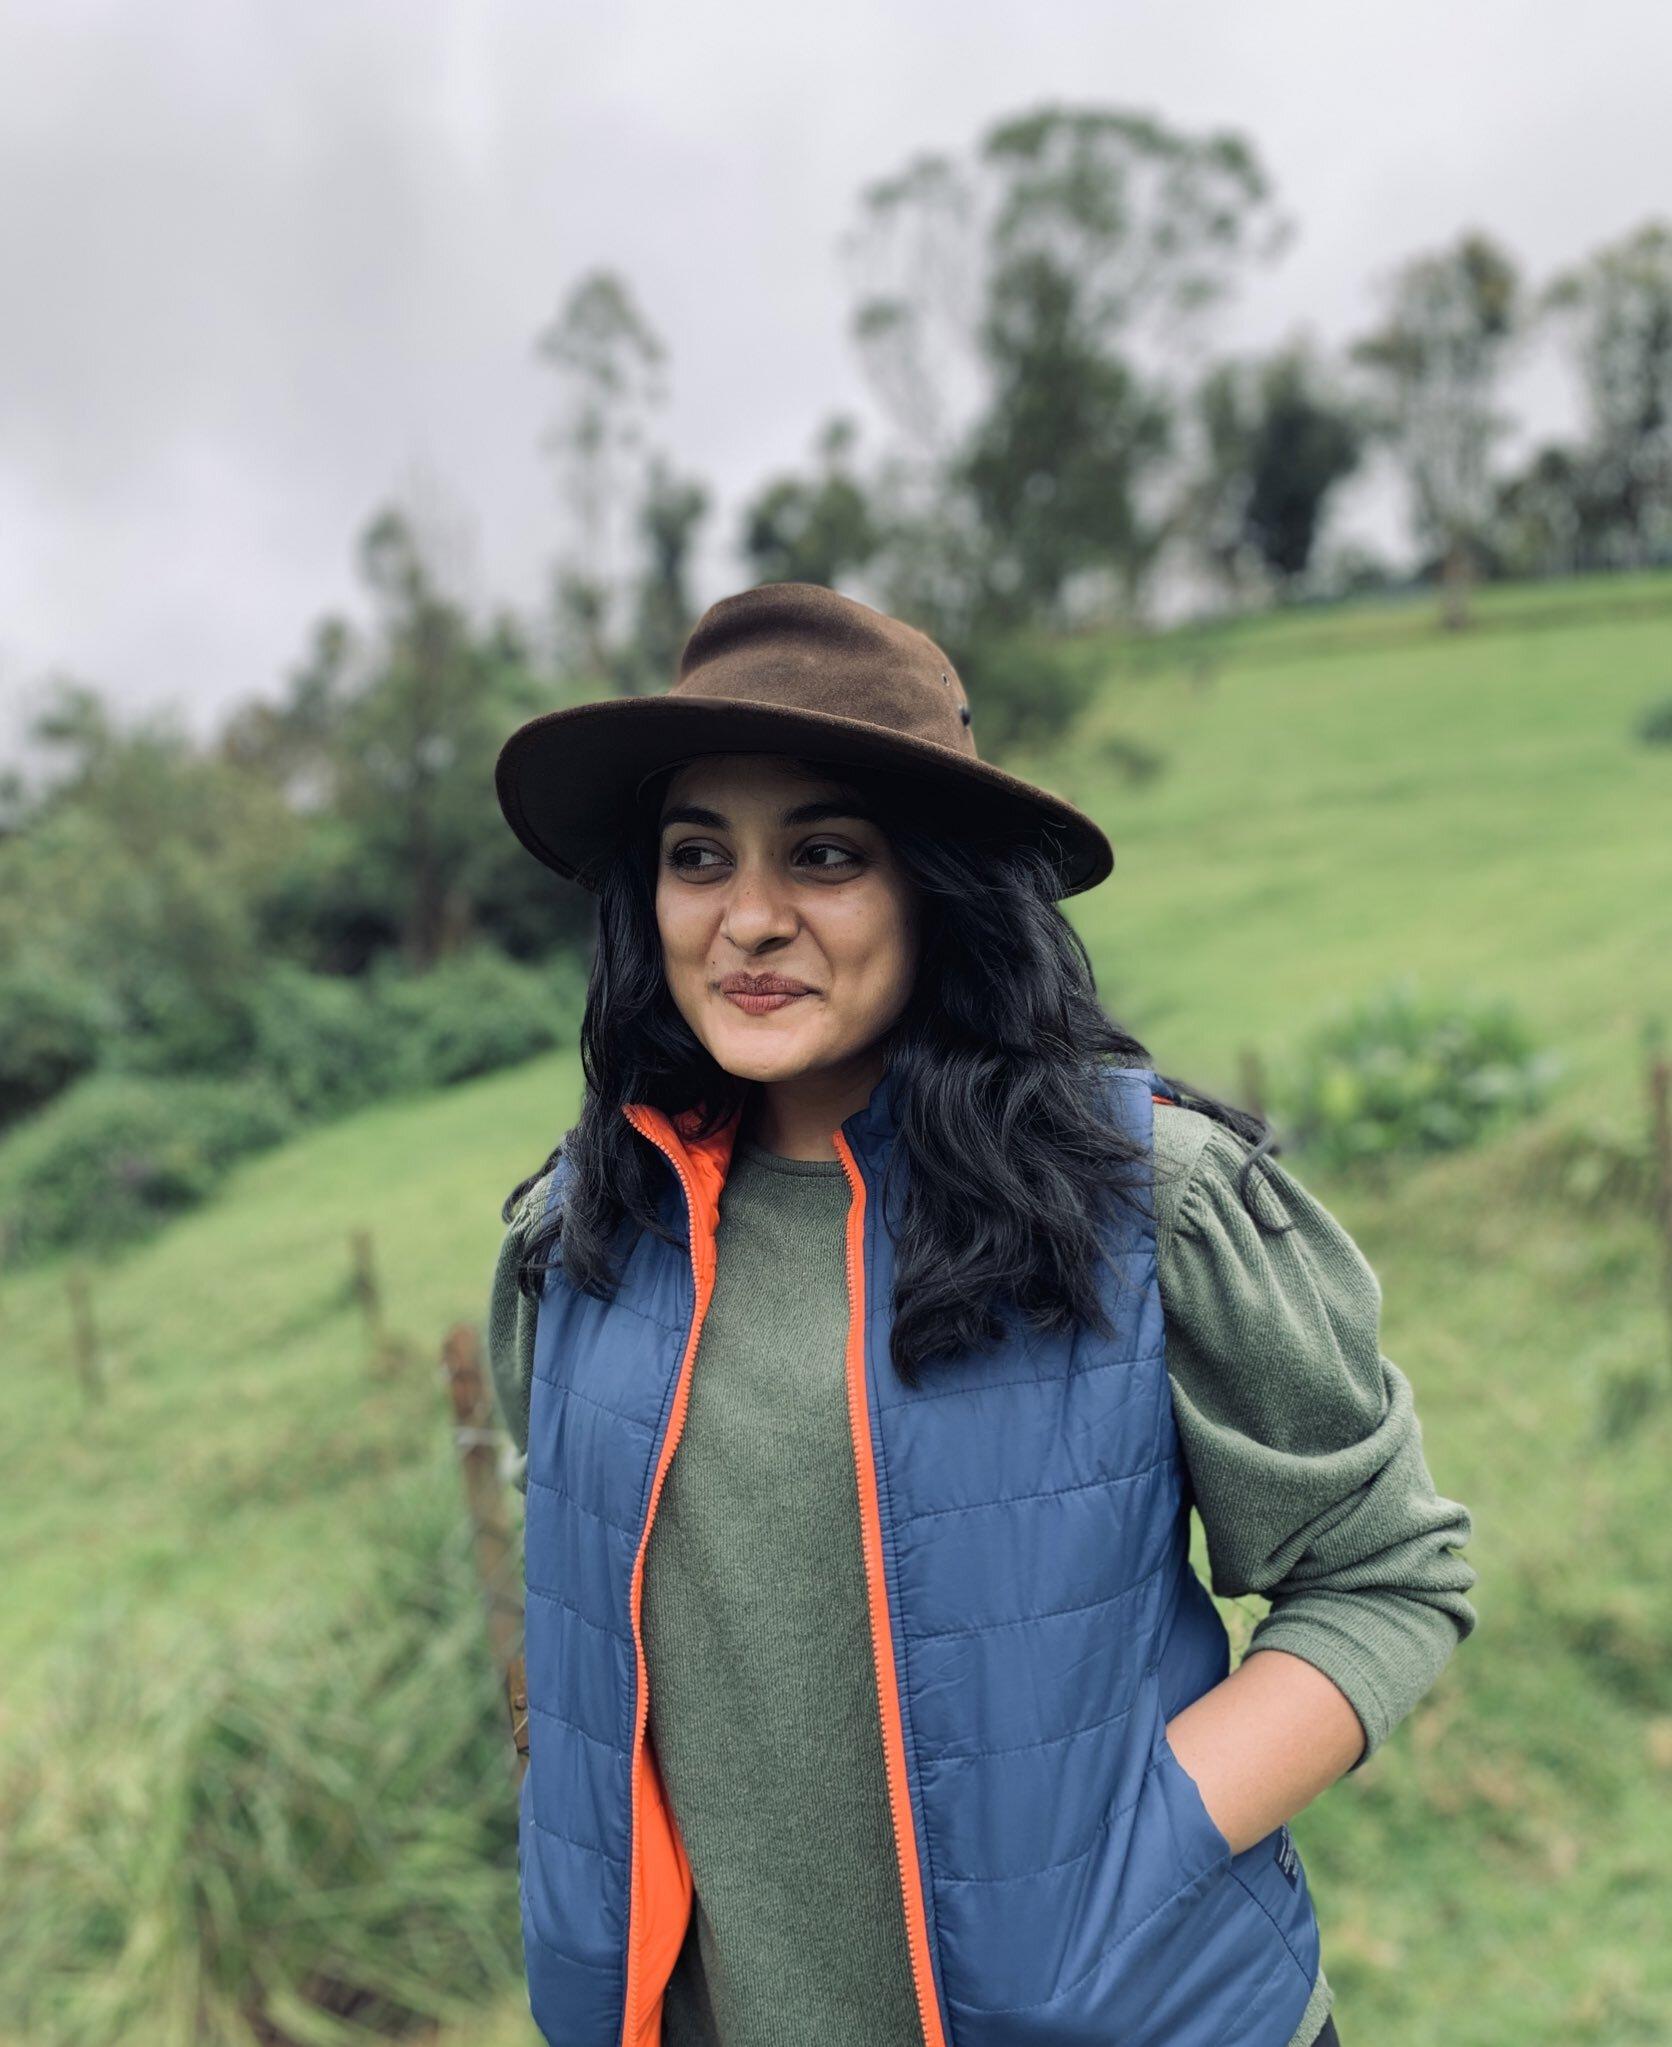 Blushing beauty Nivetha Thomas:  బ్యూటిఫుల్ స్మైల్ తో ఆకట్టుకుంటున్న మలయాళ కుట్టి (ఫొటోస్)